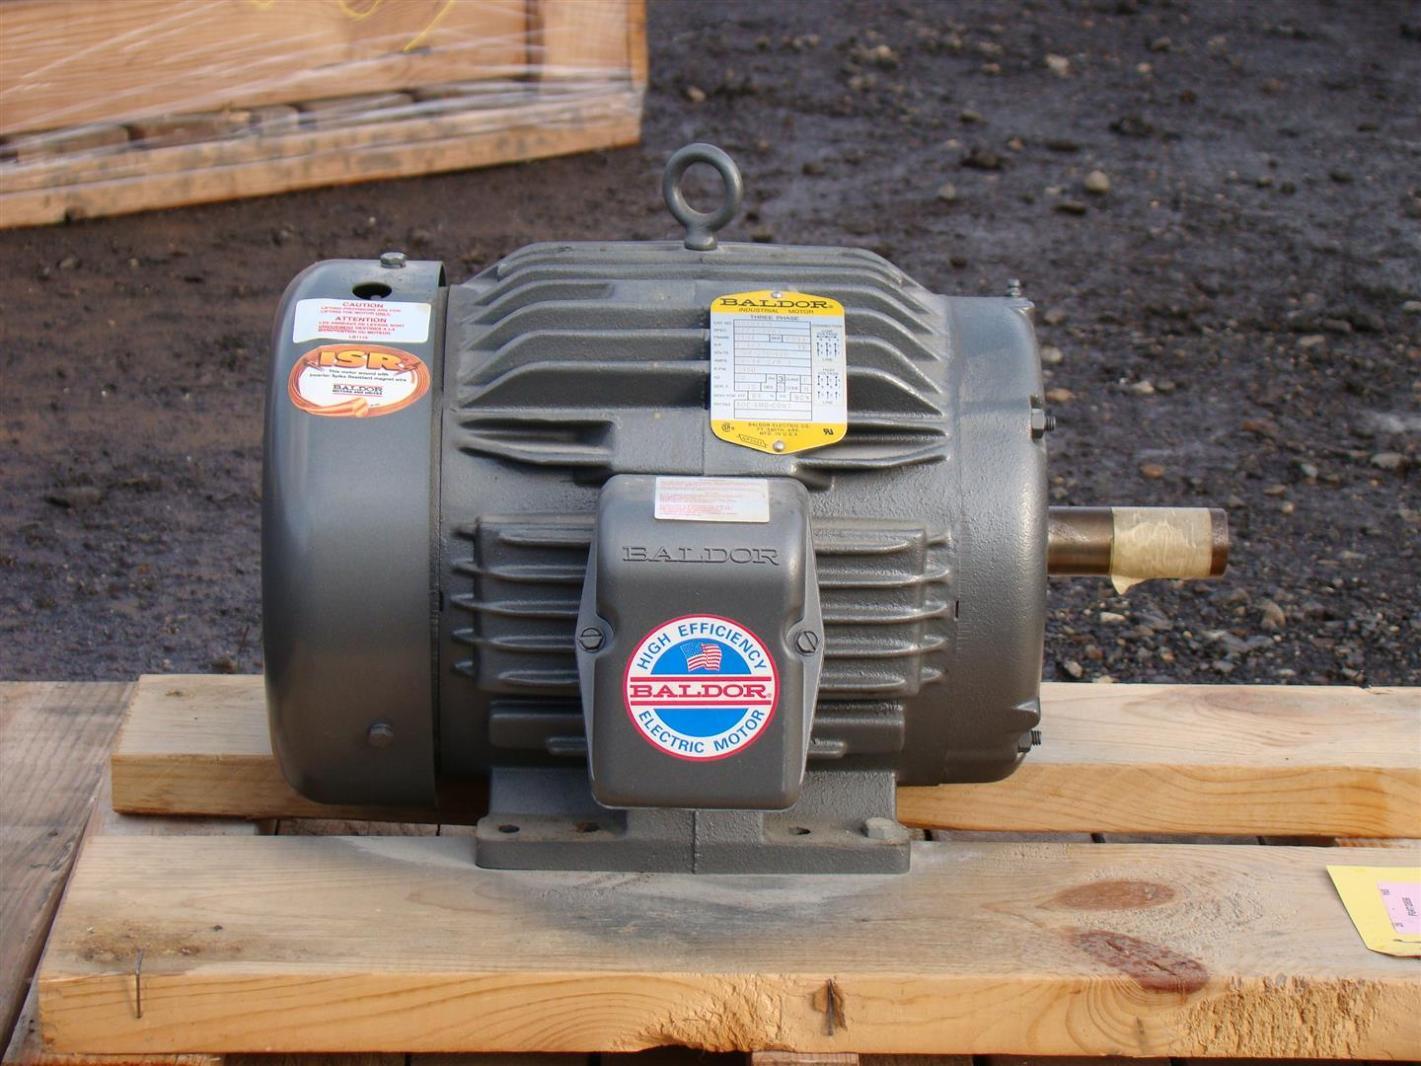 Baldor industrial motor 7 1 2hp 230 460v 18 2 9 1a 3450rpm Baldor industrial motor pump